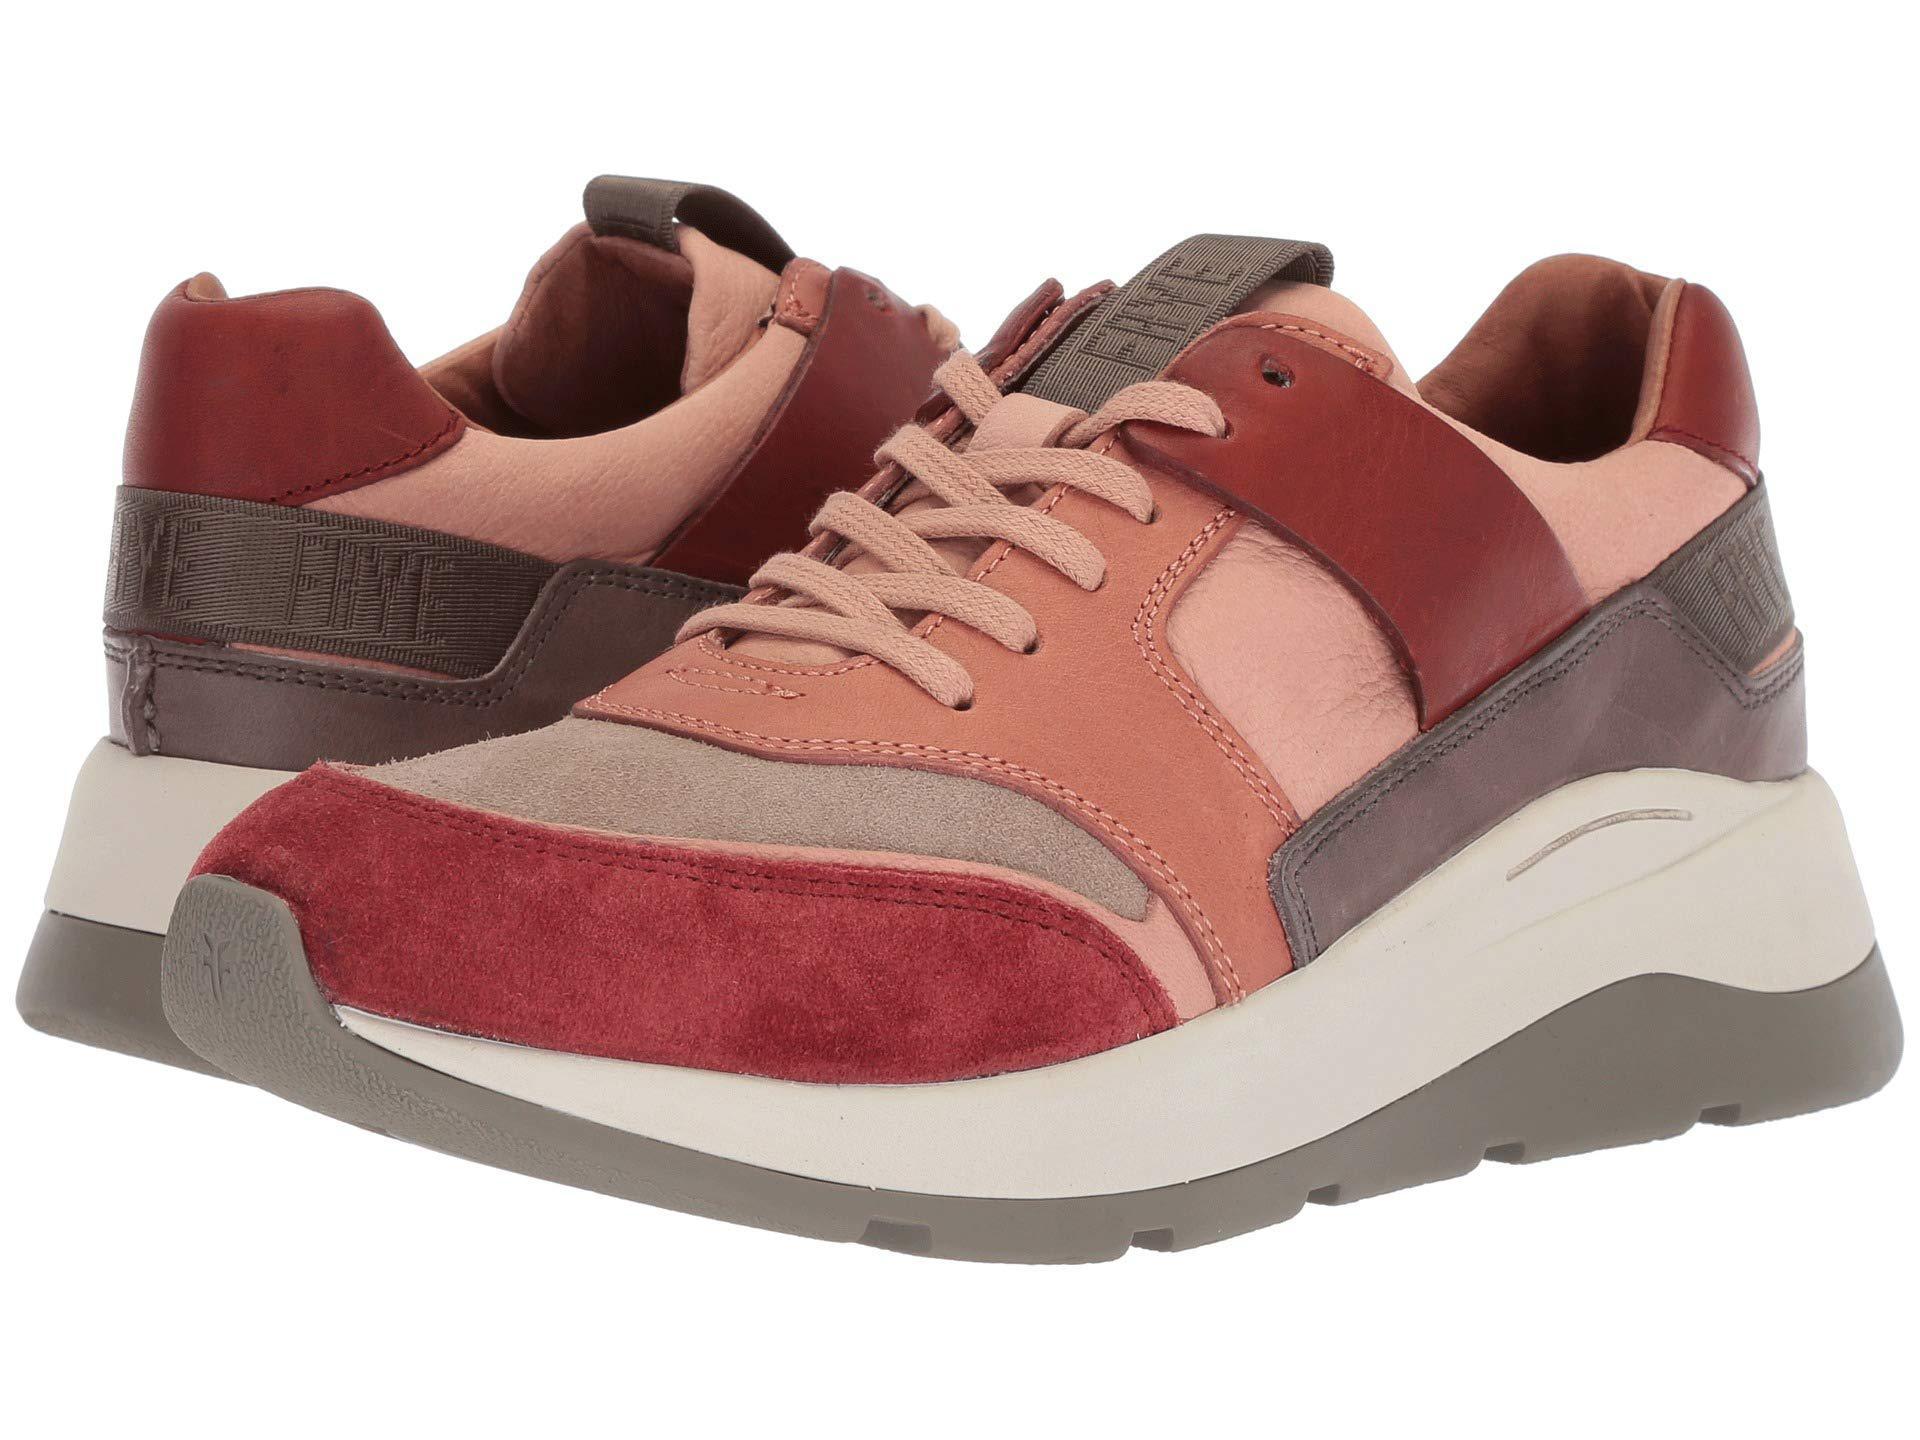 Frye Willow Low Lace Sneaker in Red